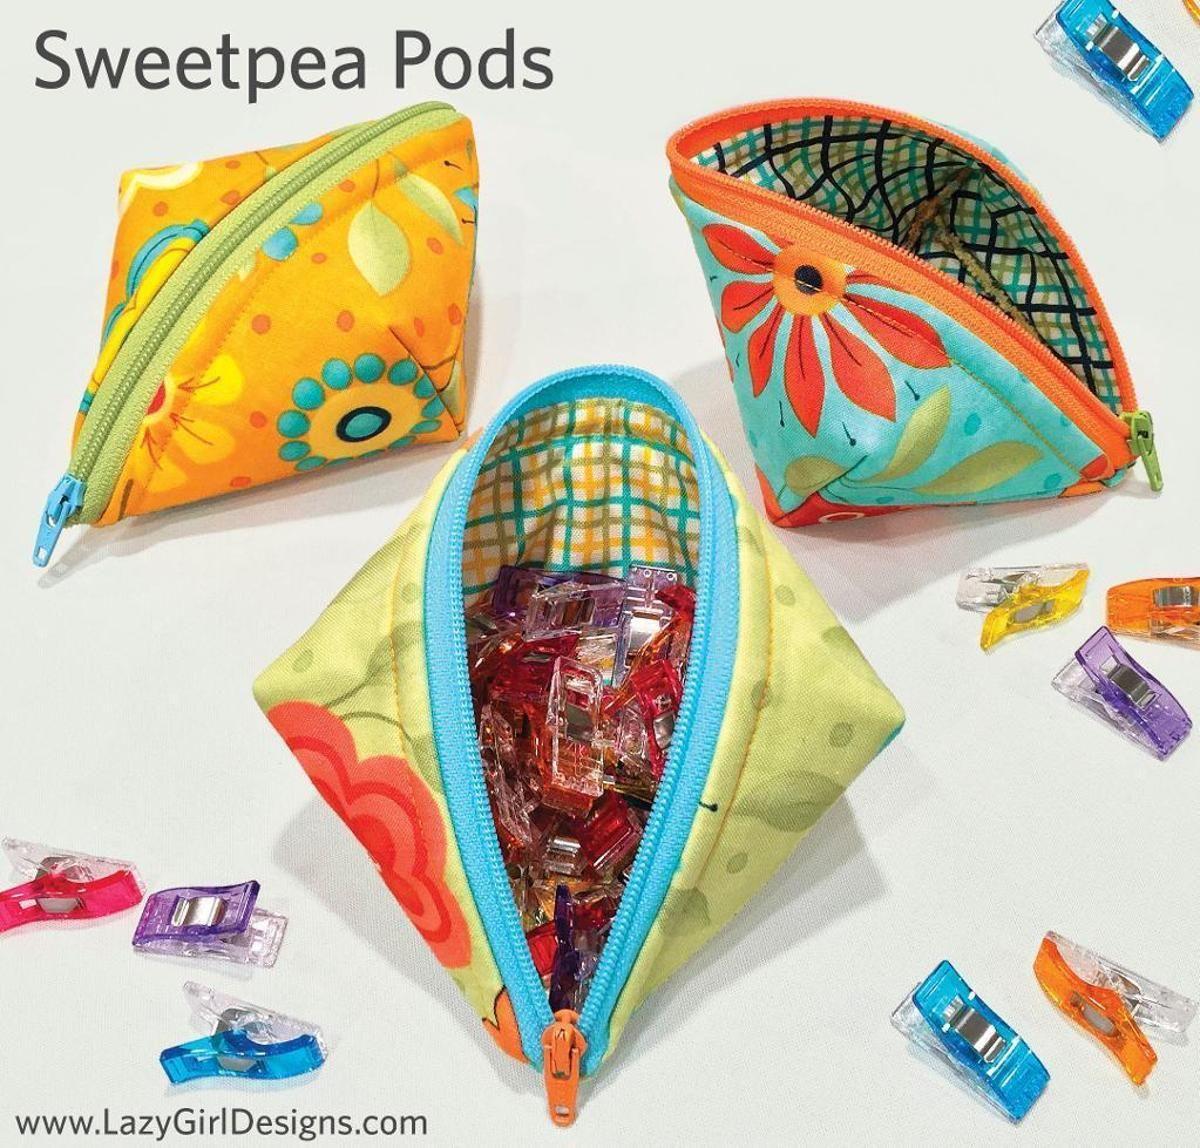 Sweetpea Pods | BOLSILLOS | Pinterest | Patchwork und Nähen